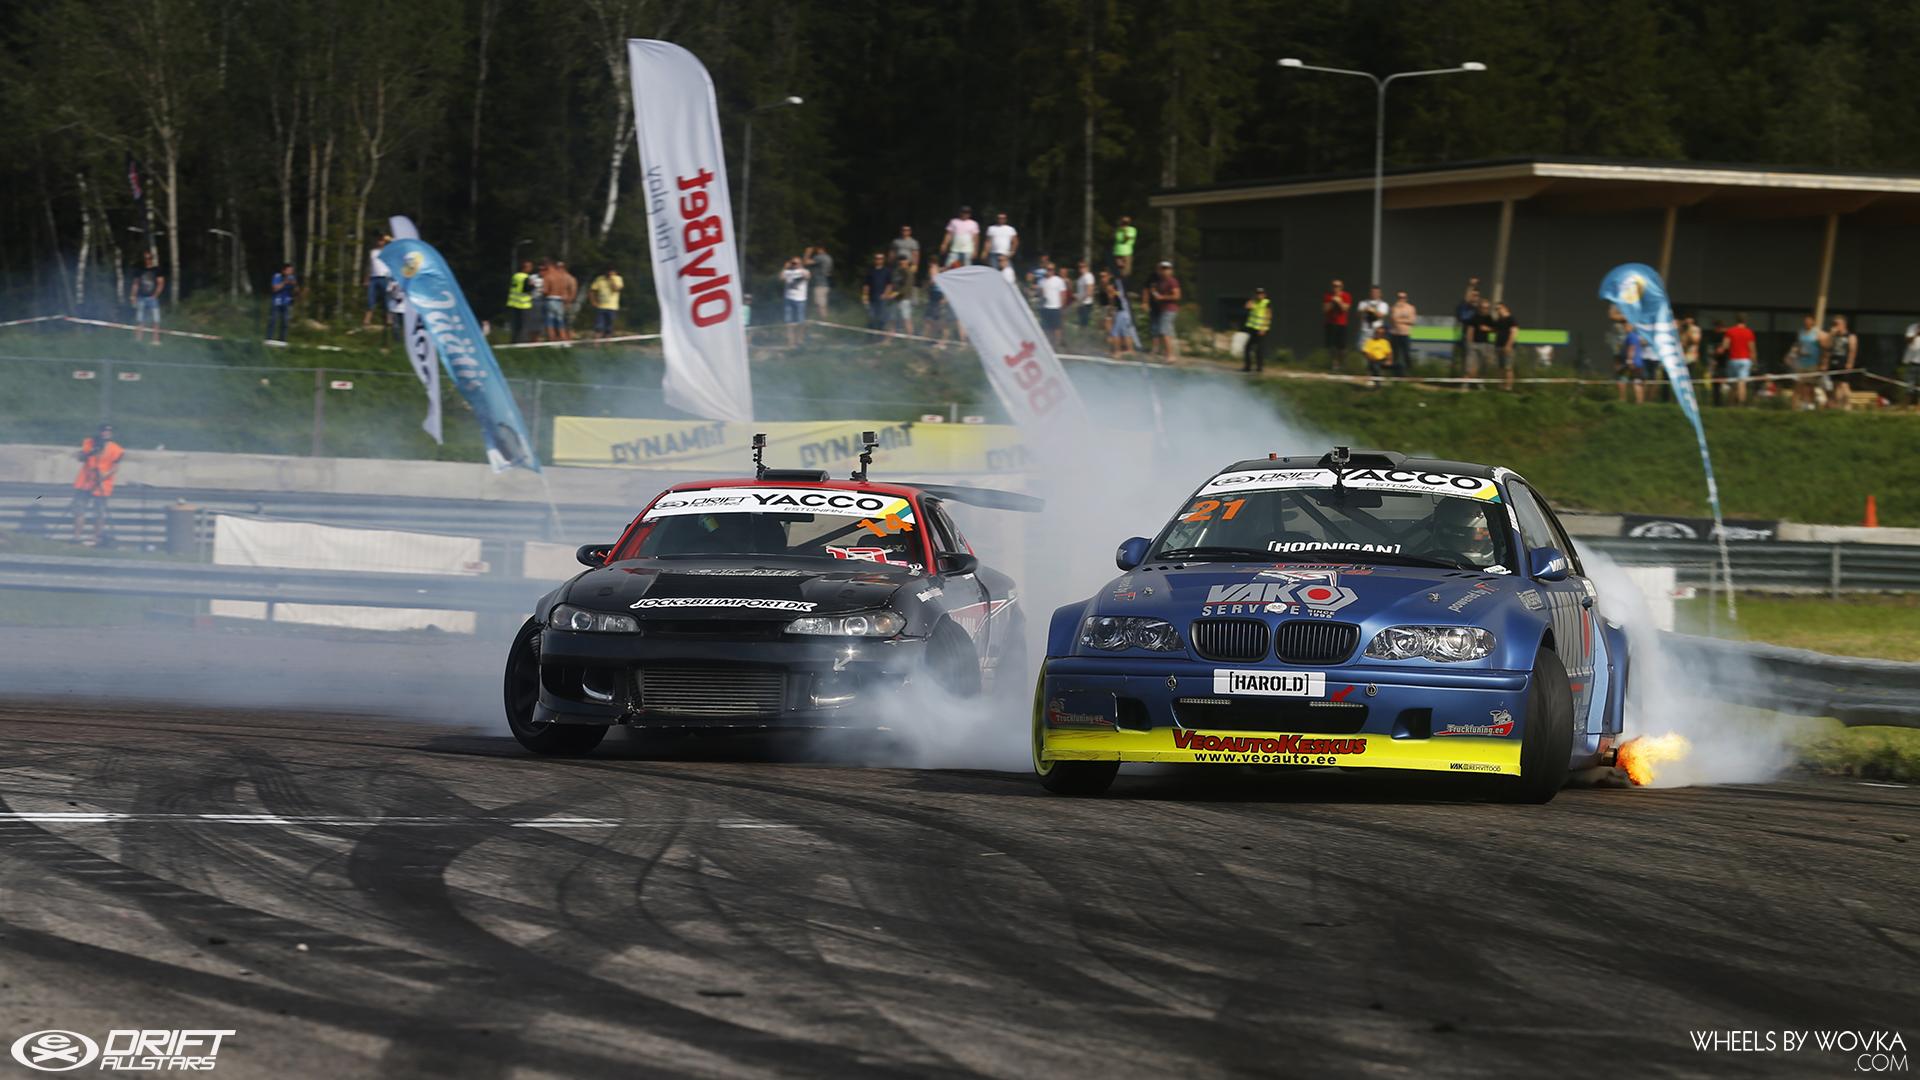 10-years-of-drifting-in-estonia-2015-by-wheelsbywovka-2